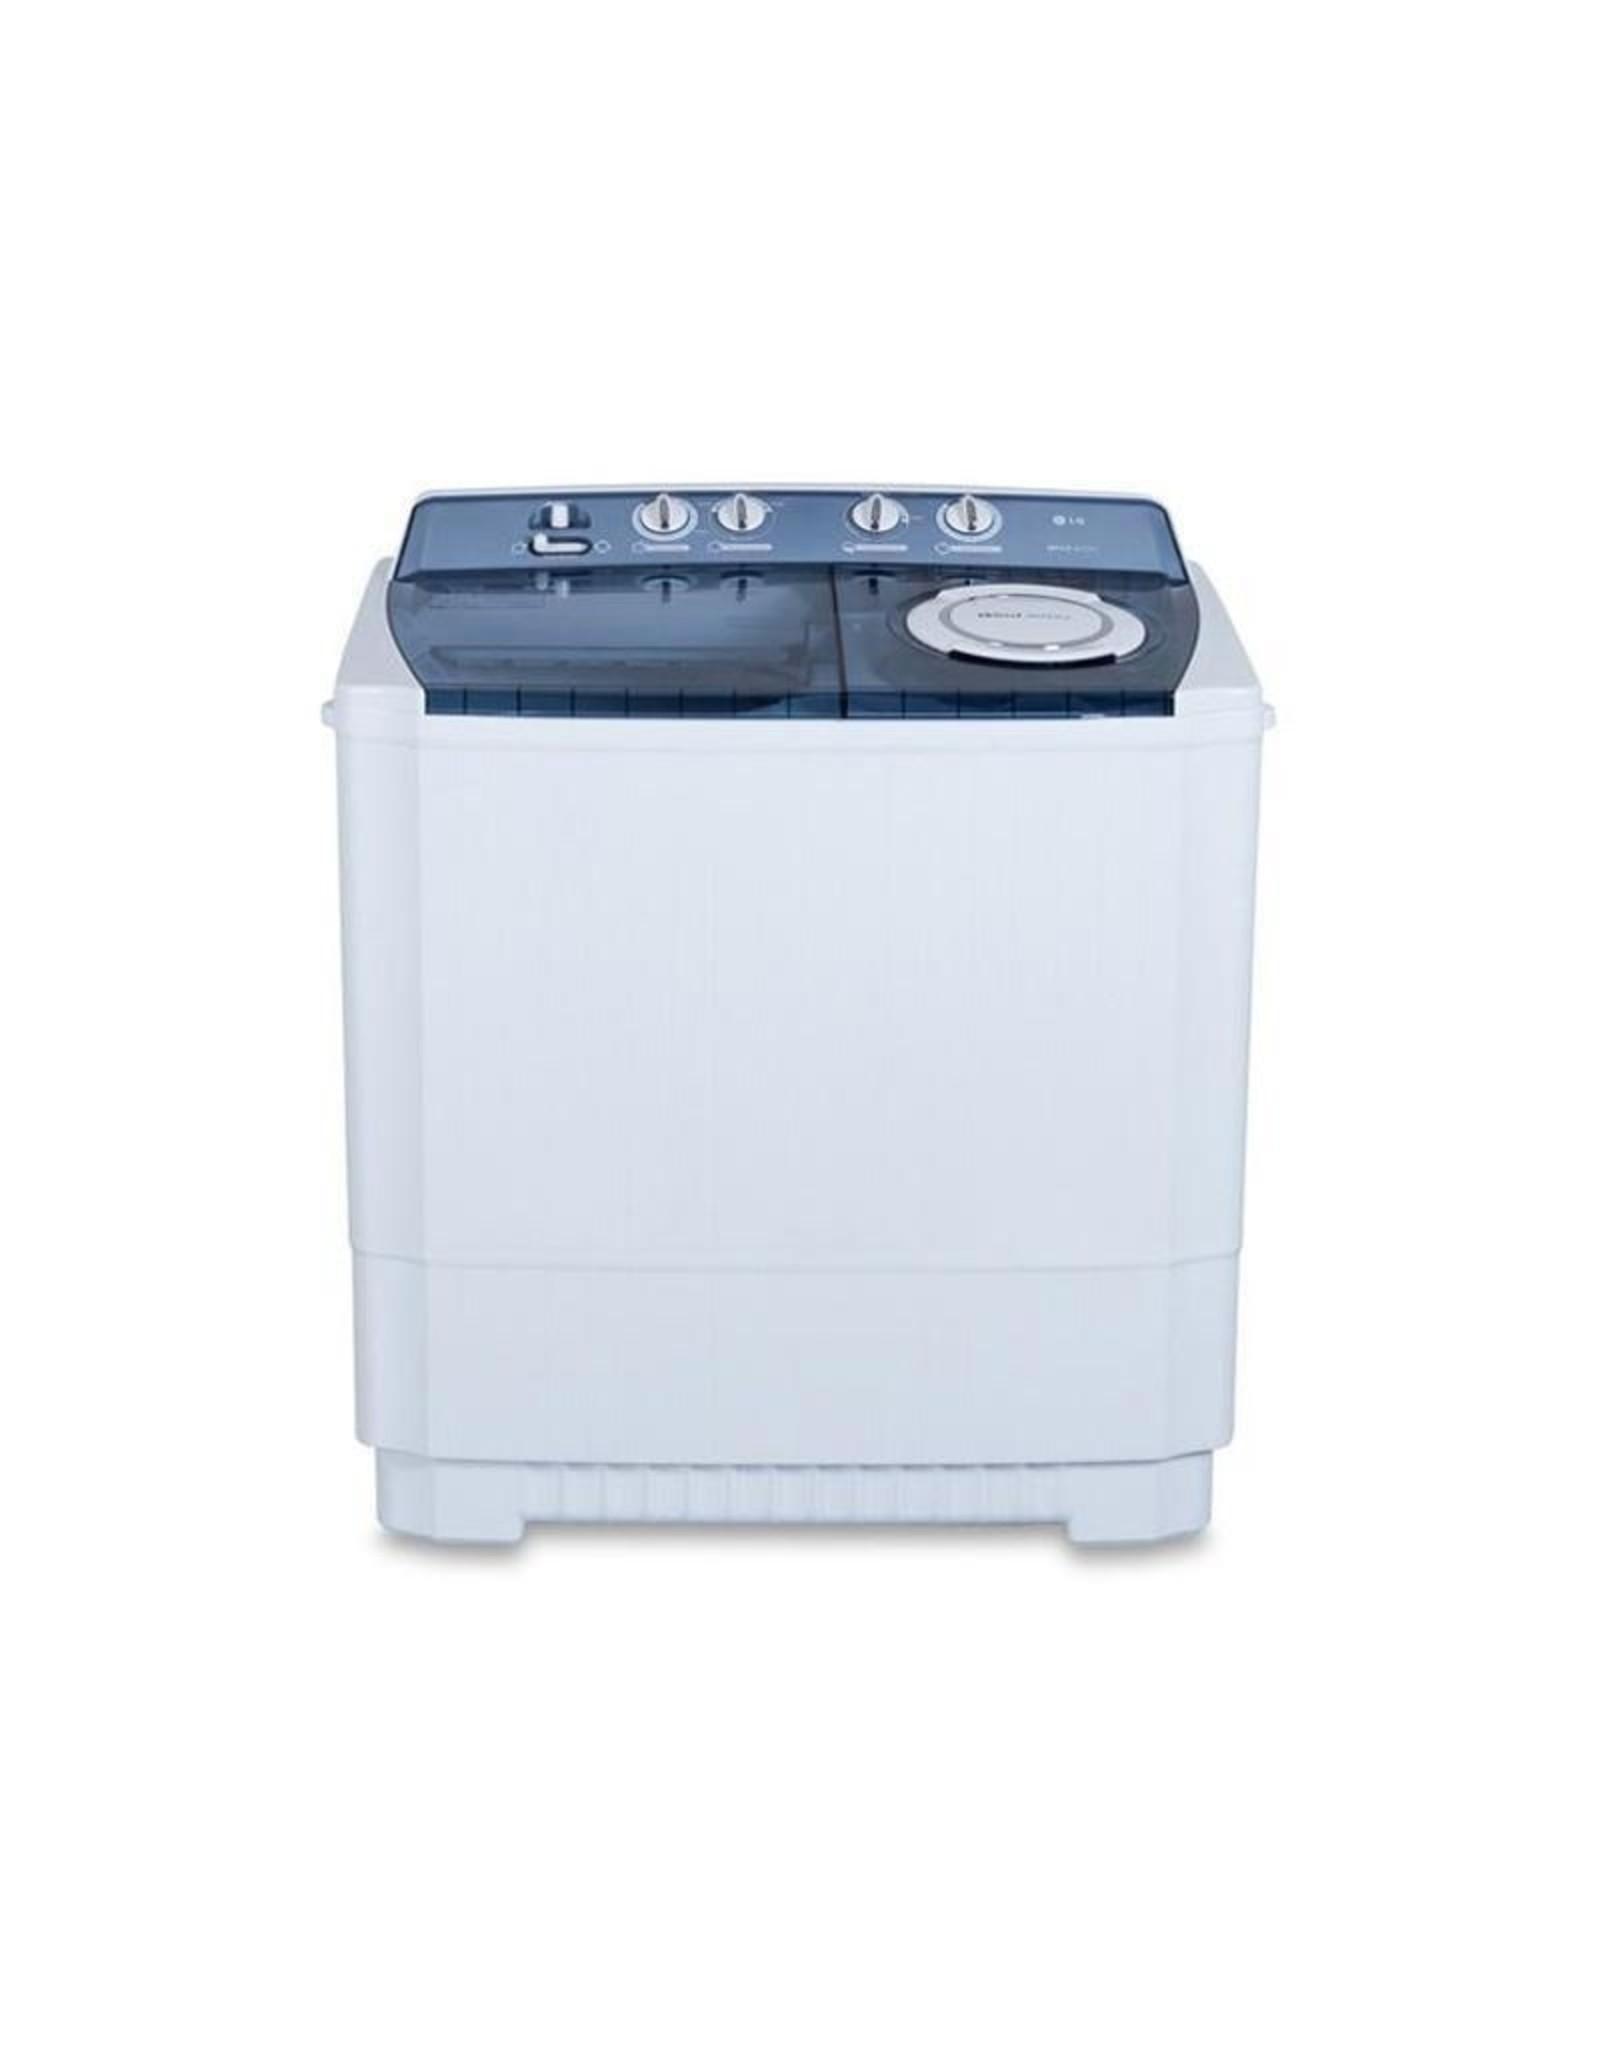 LG LG Washing Machine 16 Kg WP-1960R